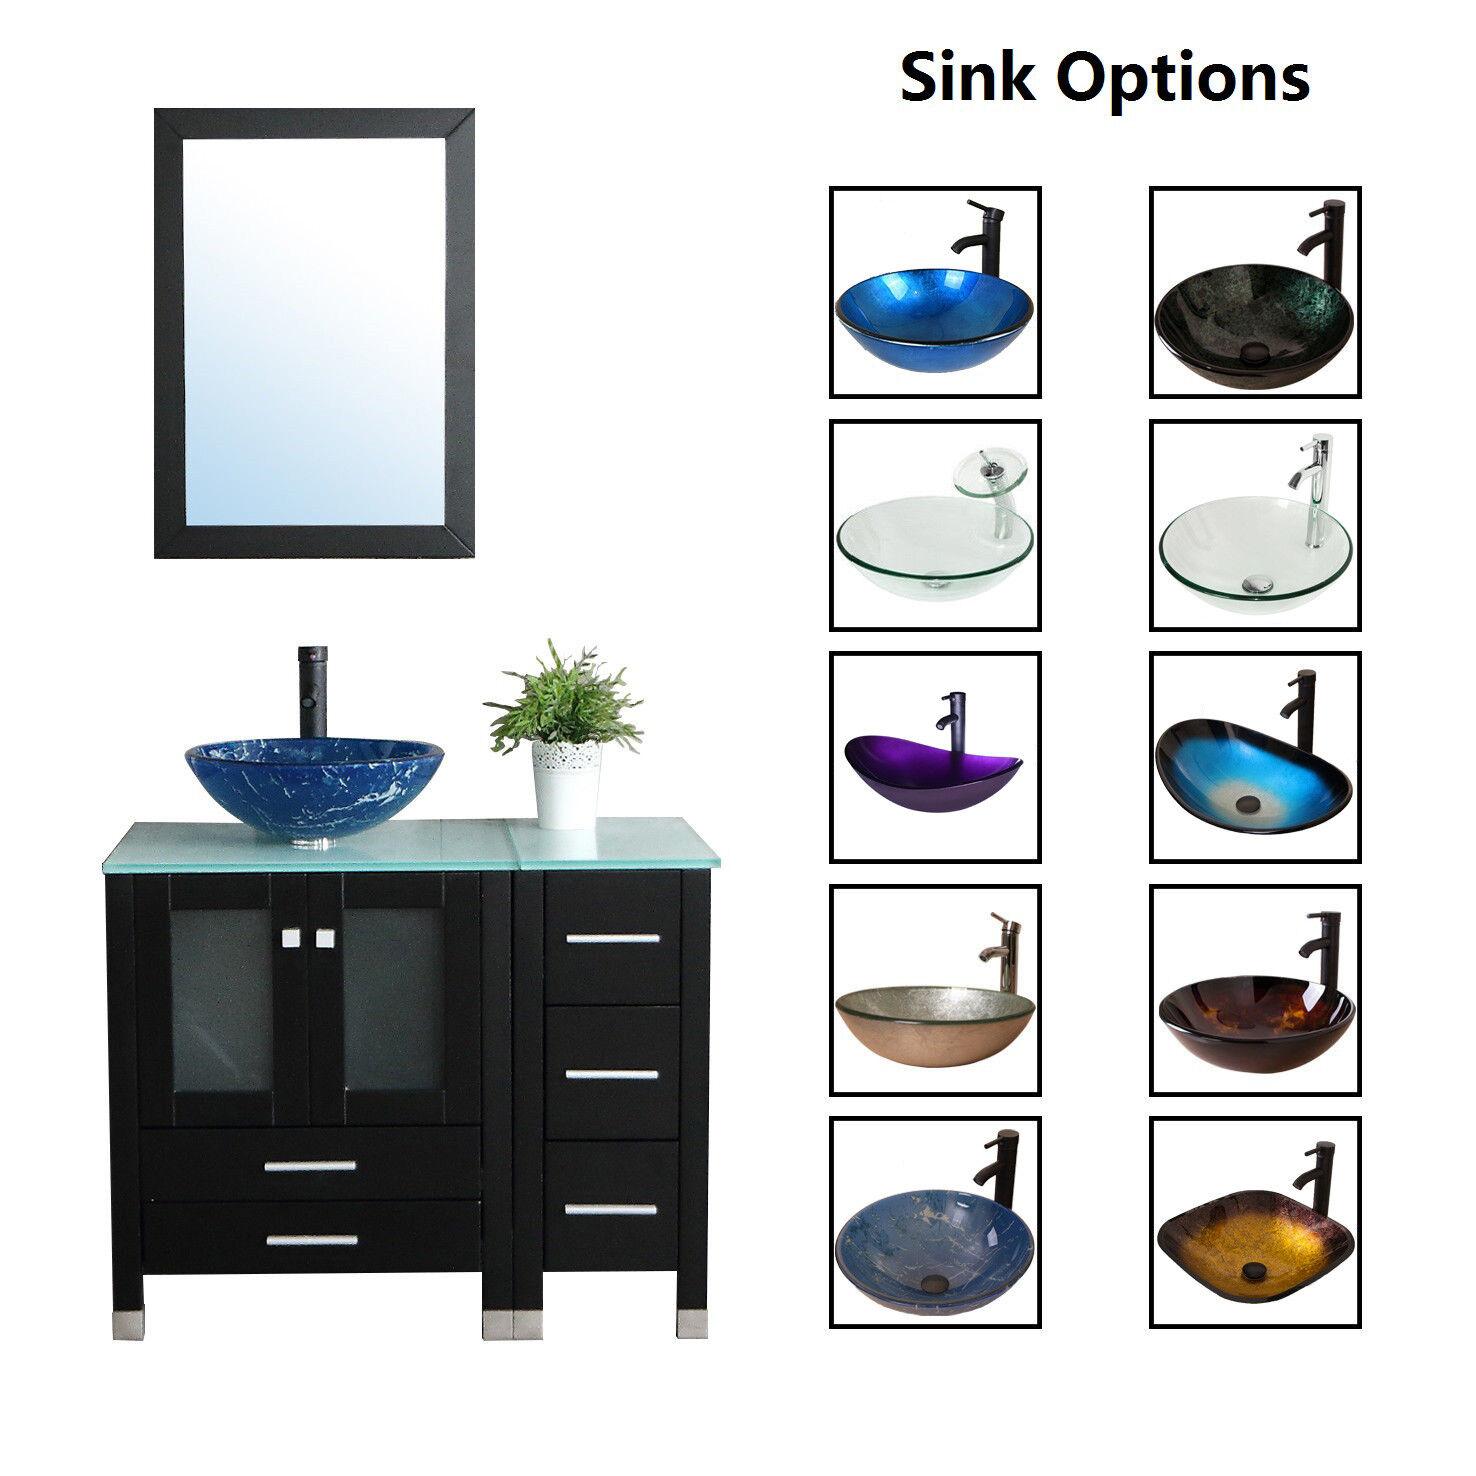 36 Bathroom Vanity Cabinet Tempered Glass Vessel Sink Bowl Faucet